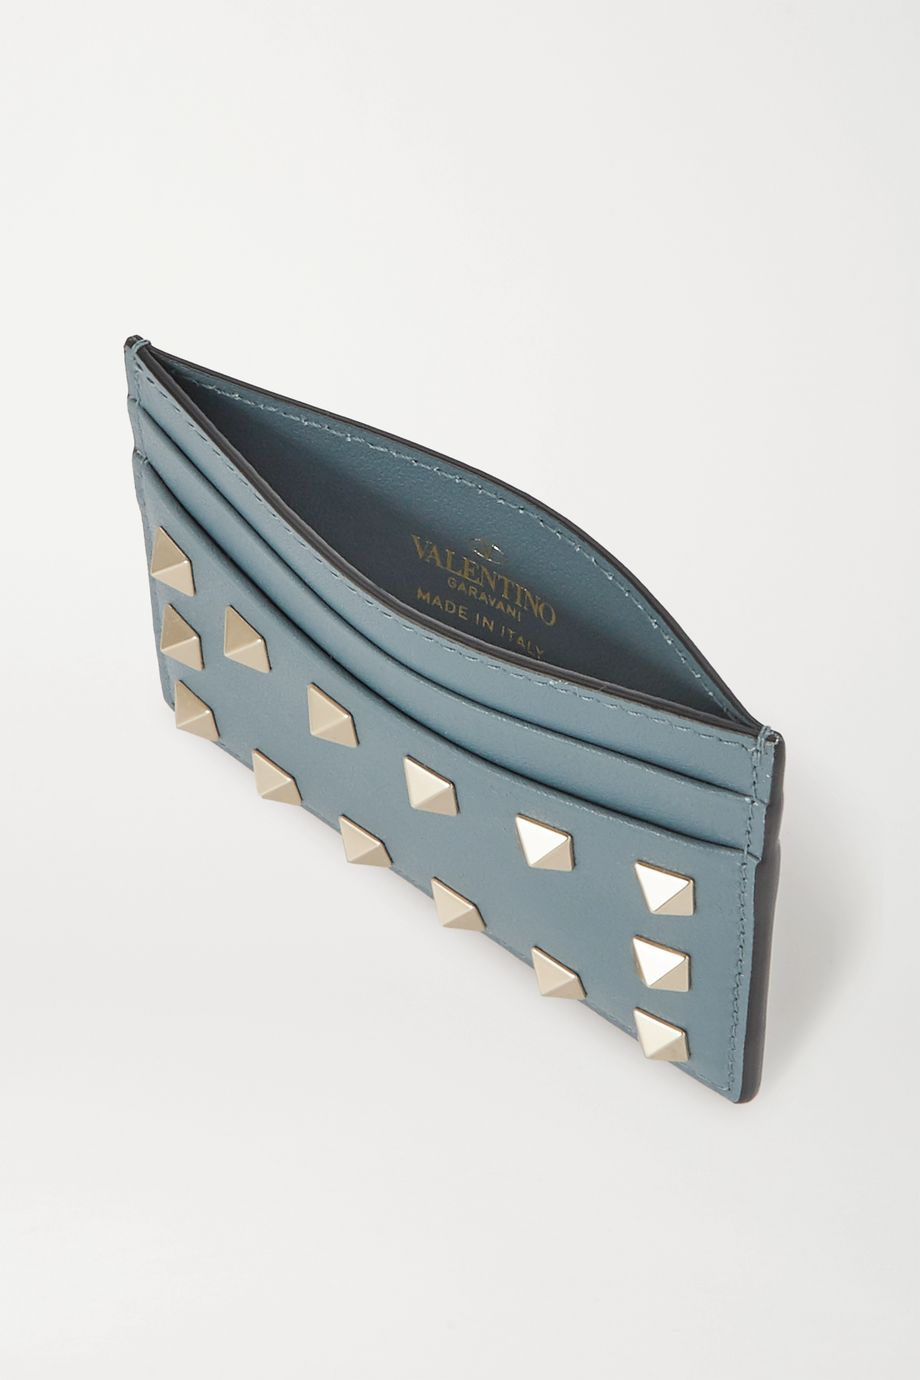 Valentino Valentino Garavani Rockstud textured-leather cardholder